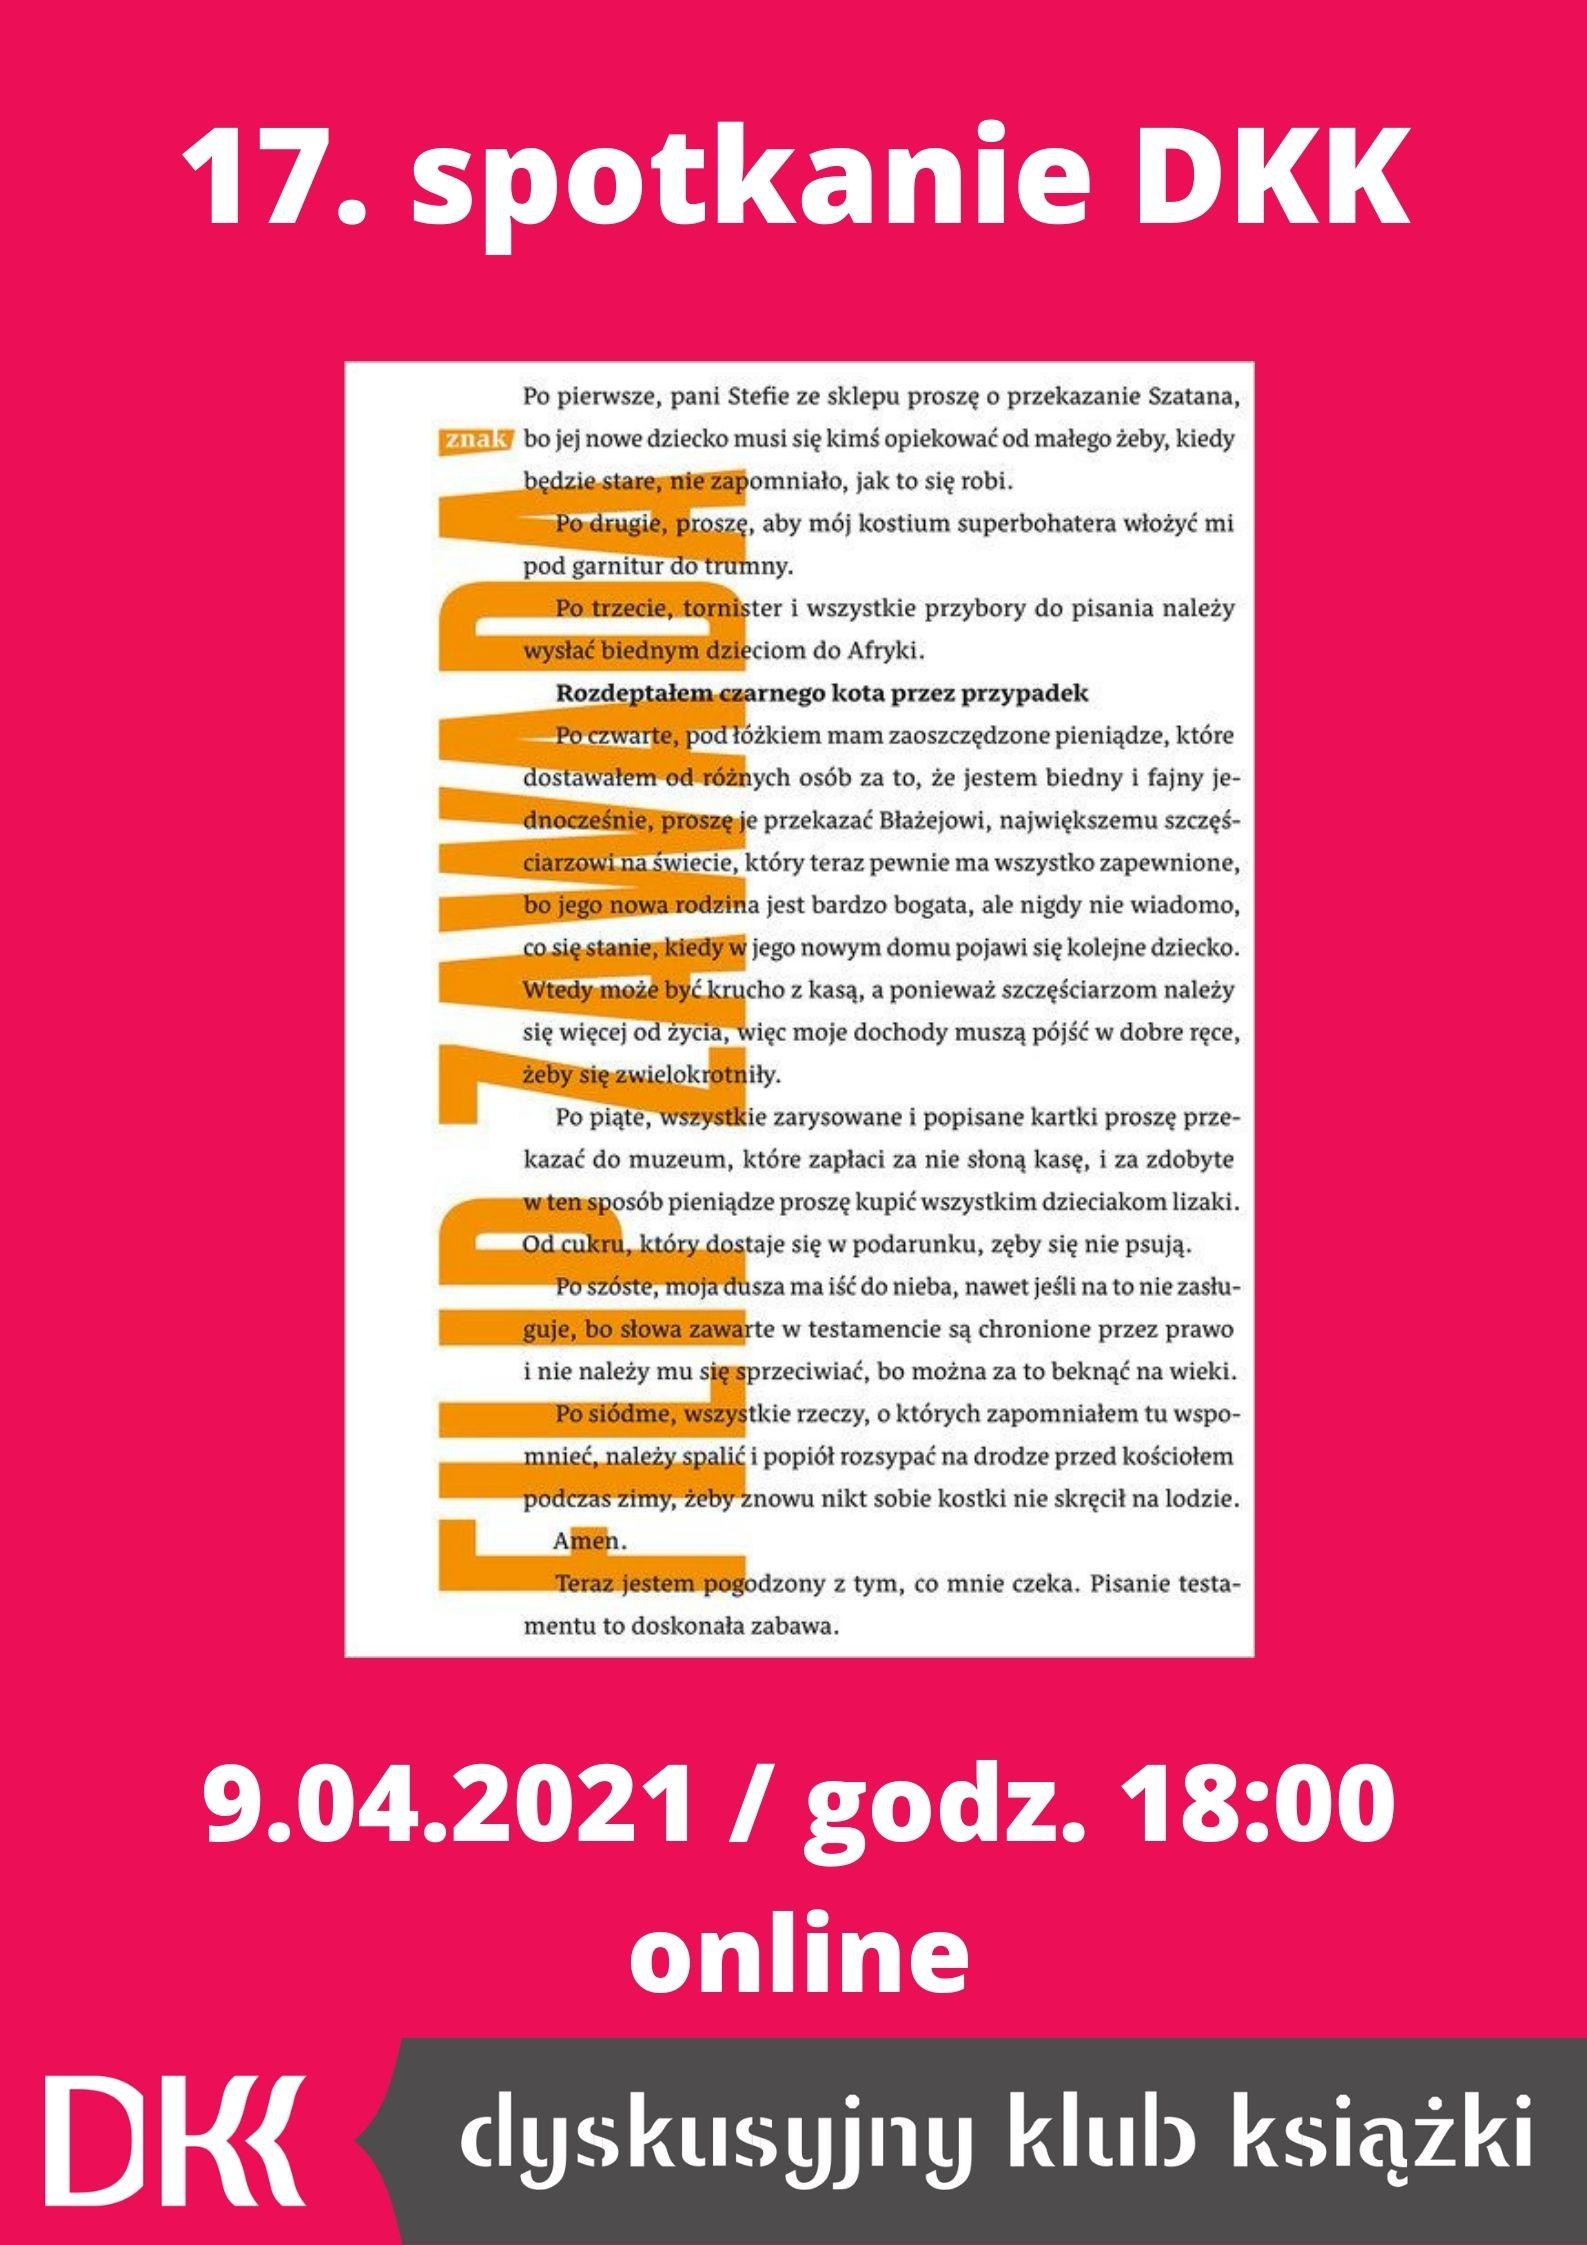 dkk-spotkanie-filip-zawada-plakat